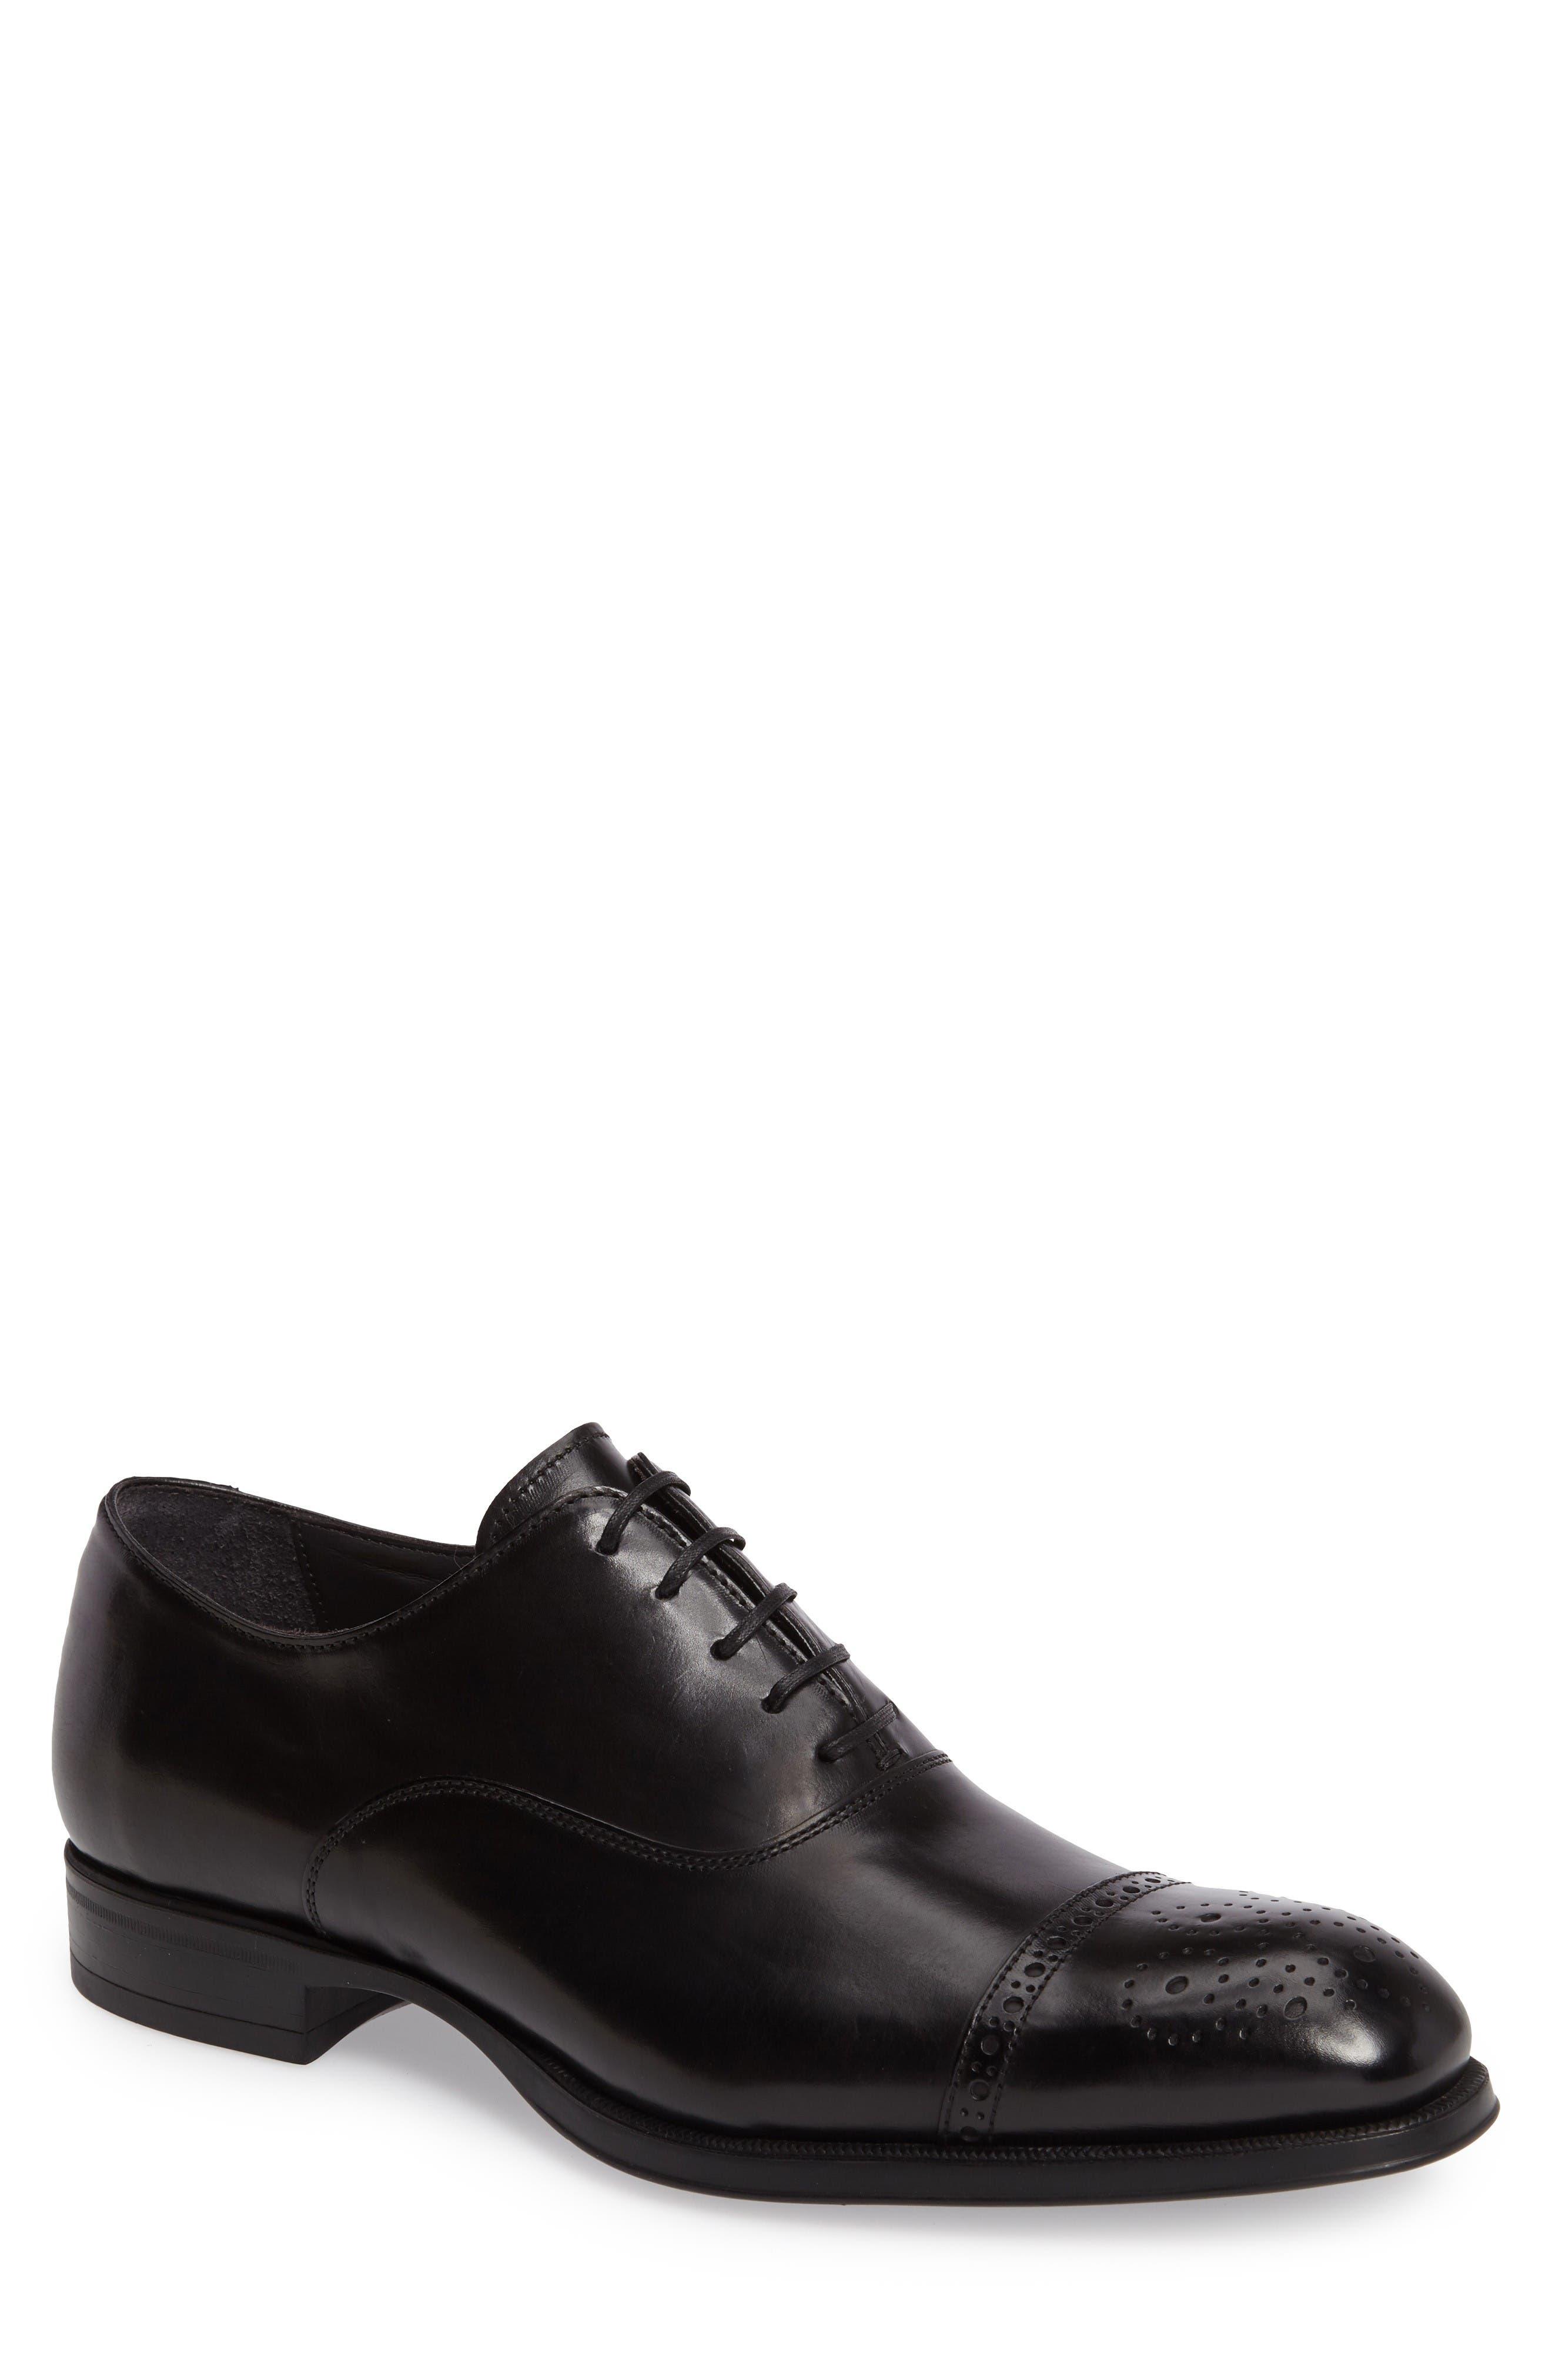 'Justin' Cap Toe Oxford,                             Main thumbnail 1, color,                             Black Leather